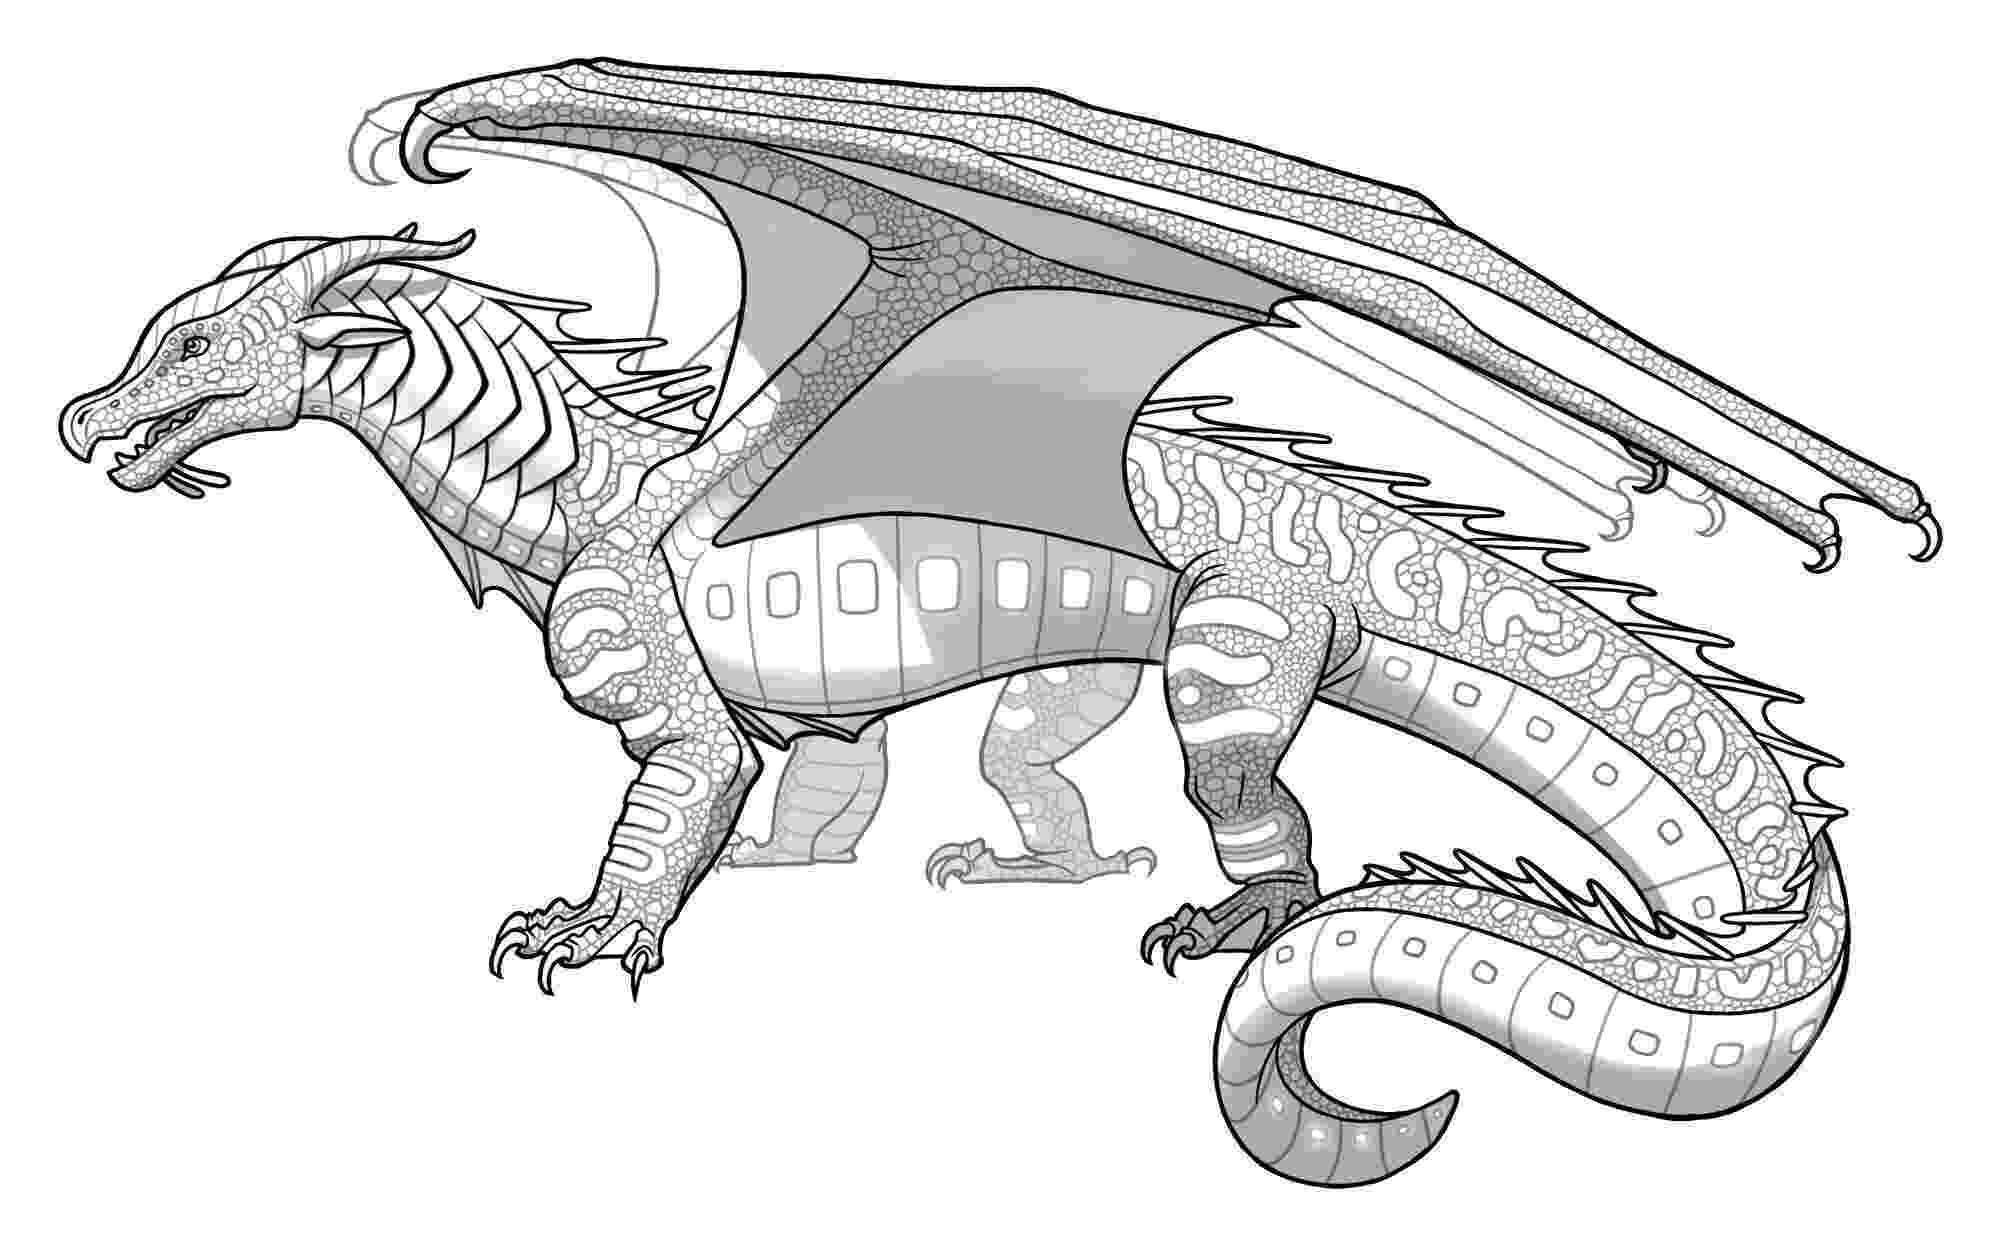 skywing dragon icewing name generator wiki wings of fire amino skywing dragon